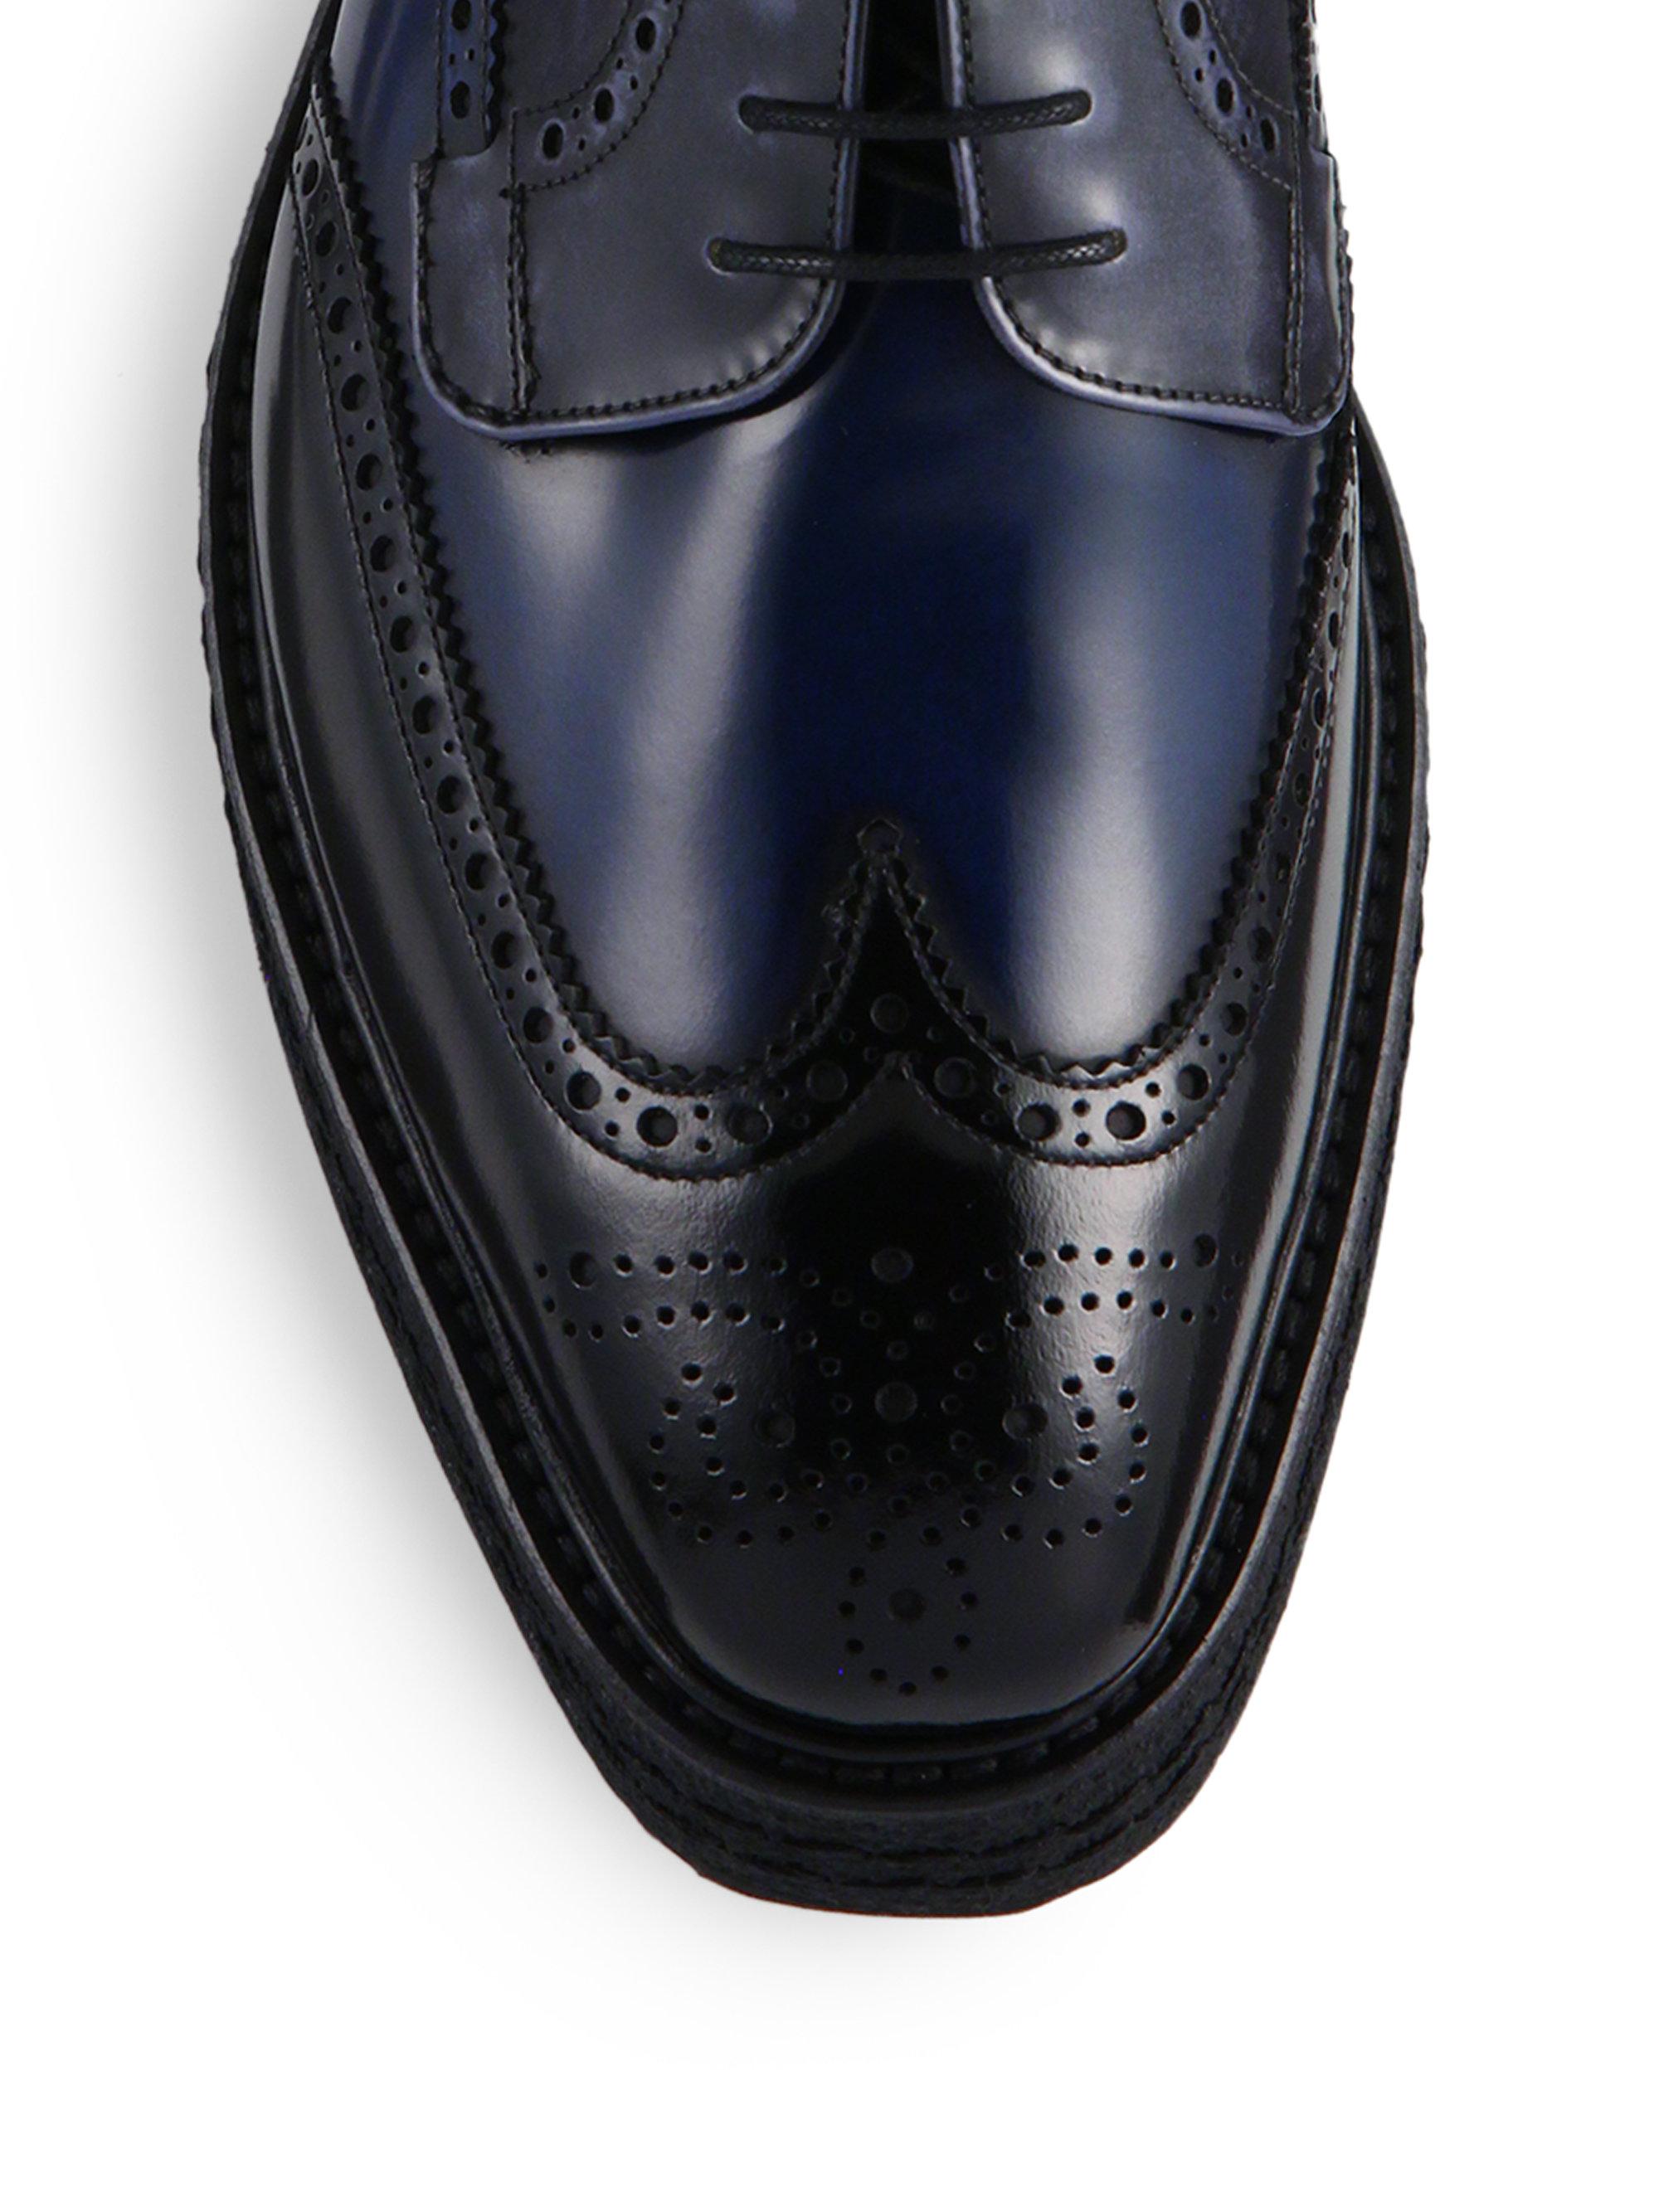 2a876973bb86 ... medallion toe dress shoe 97fc8 a671d  wholesale lyst prada creeper lug  sole leather derby shoes in black for men 149c5 a8da6